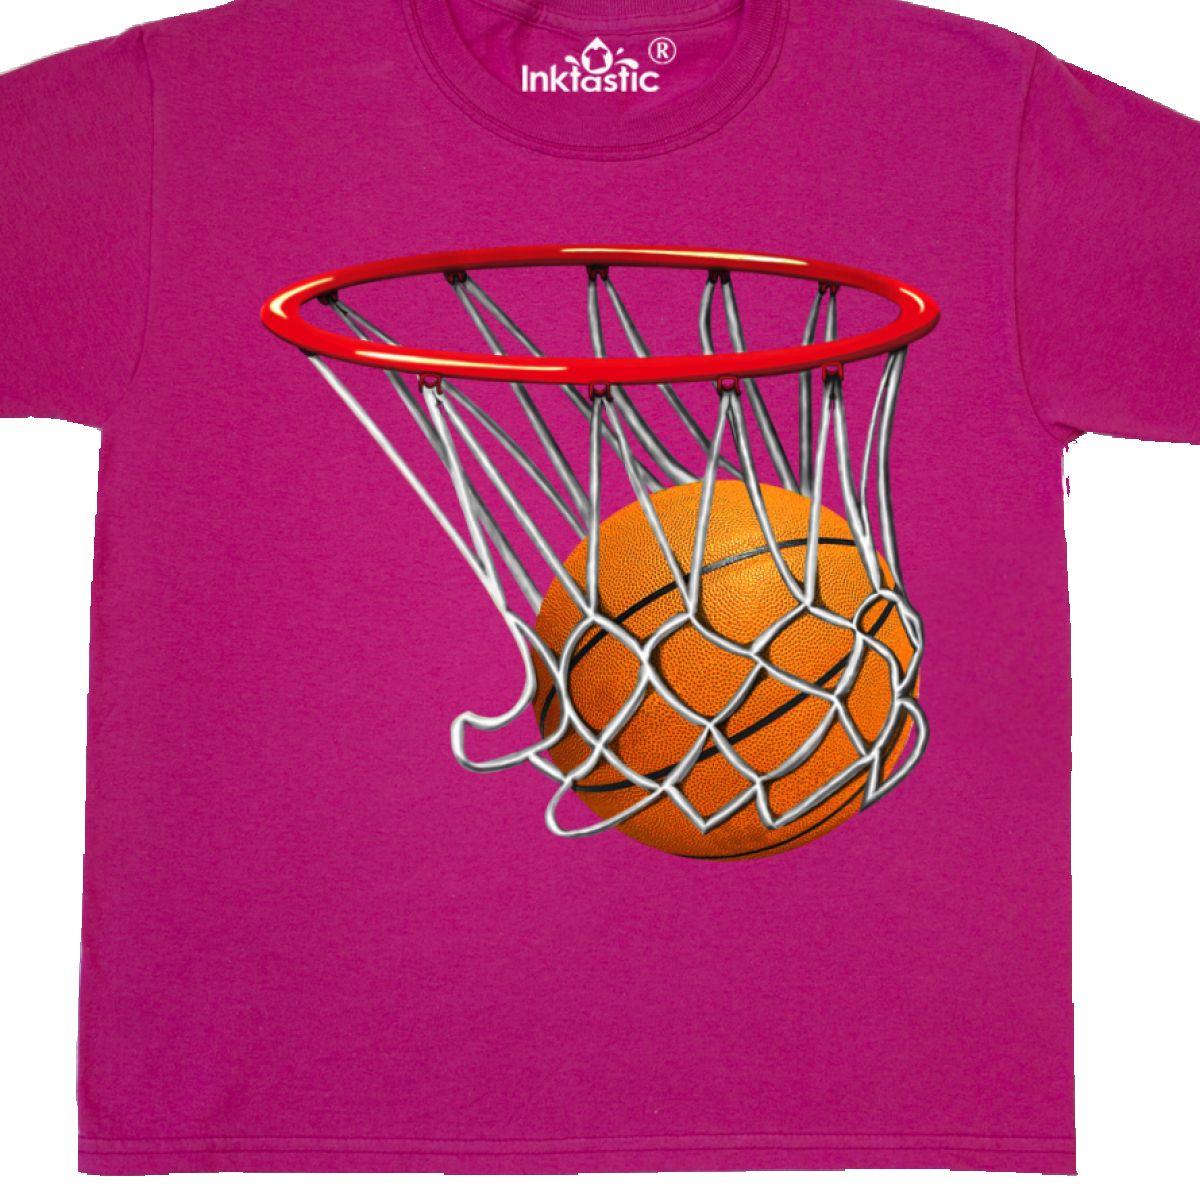 Inktastic Basketball Swish Youth T-Shirt Hoop Shoot Hoops Bball Sports Baller